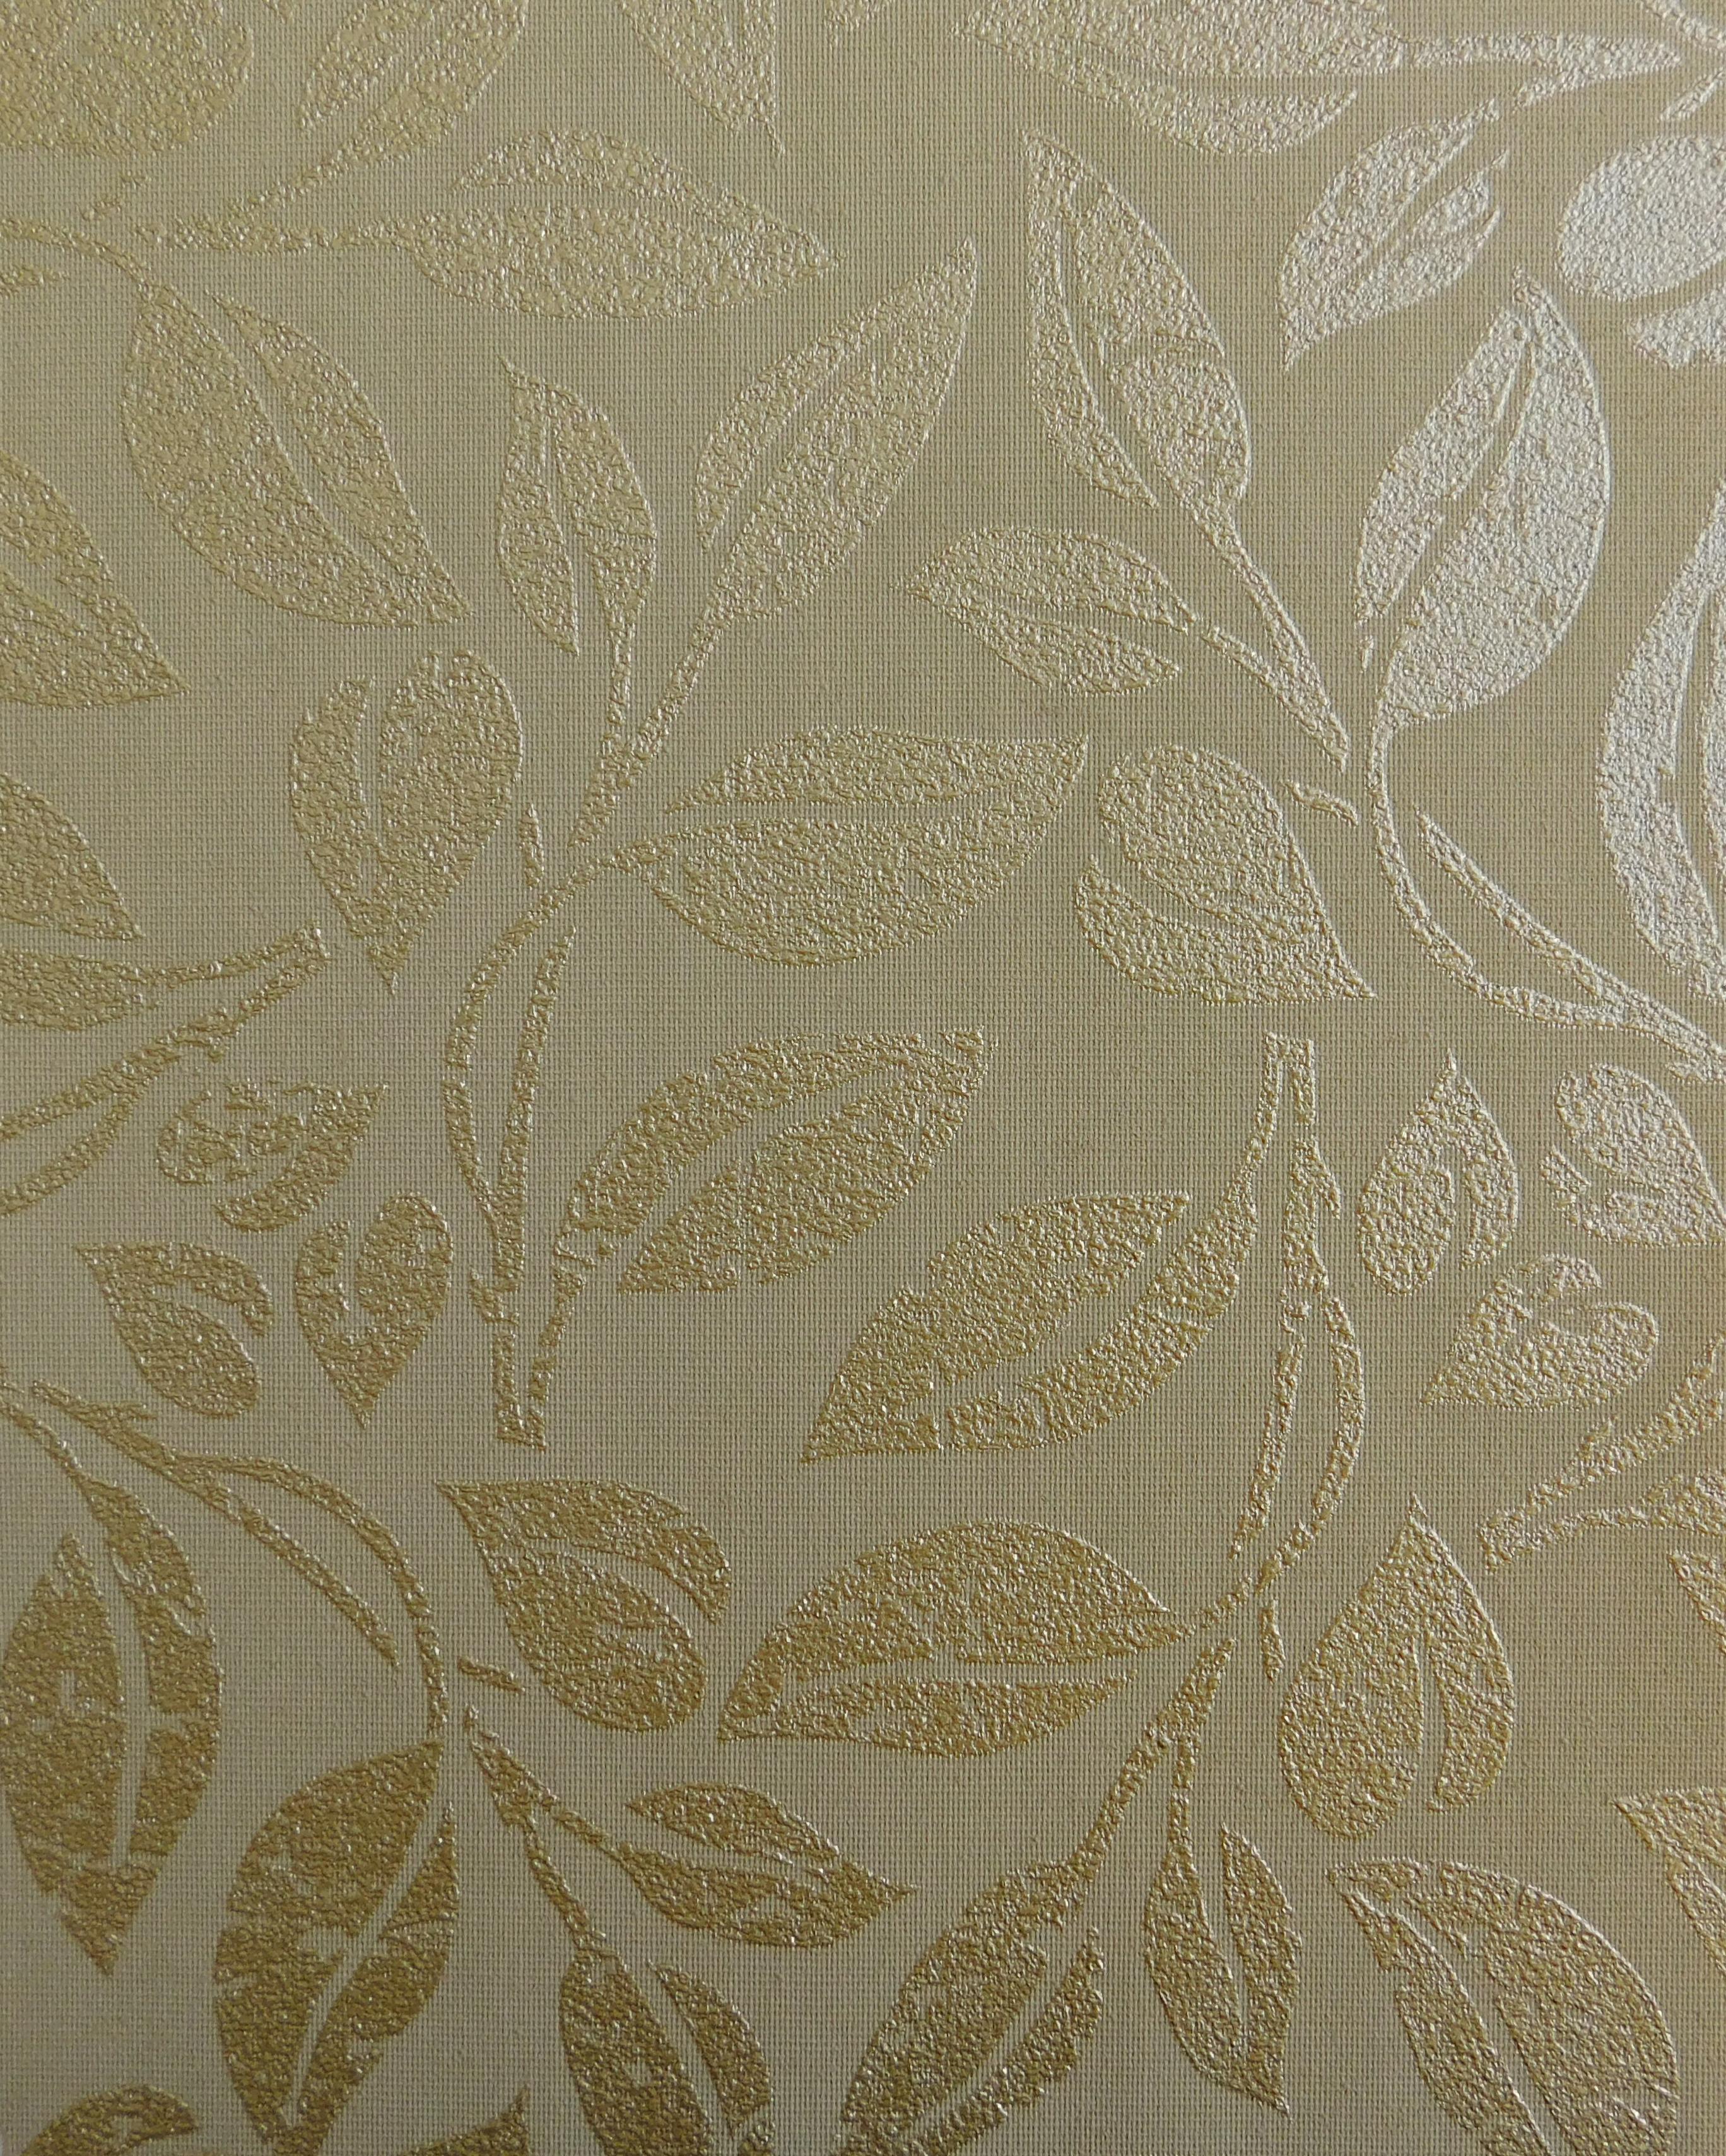 Foliage Gold Sheen Louvolite System